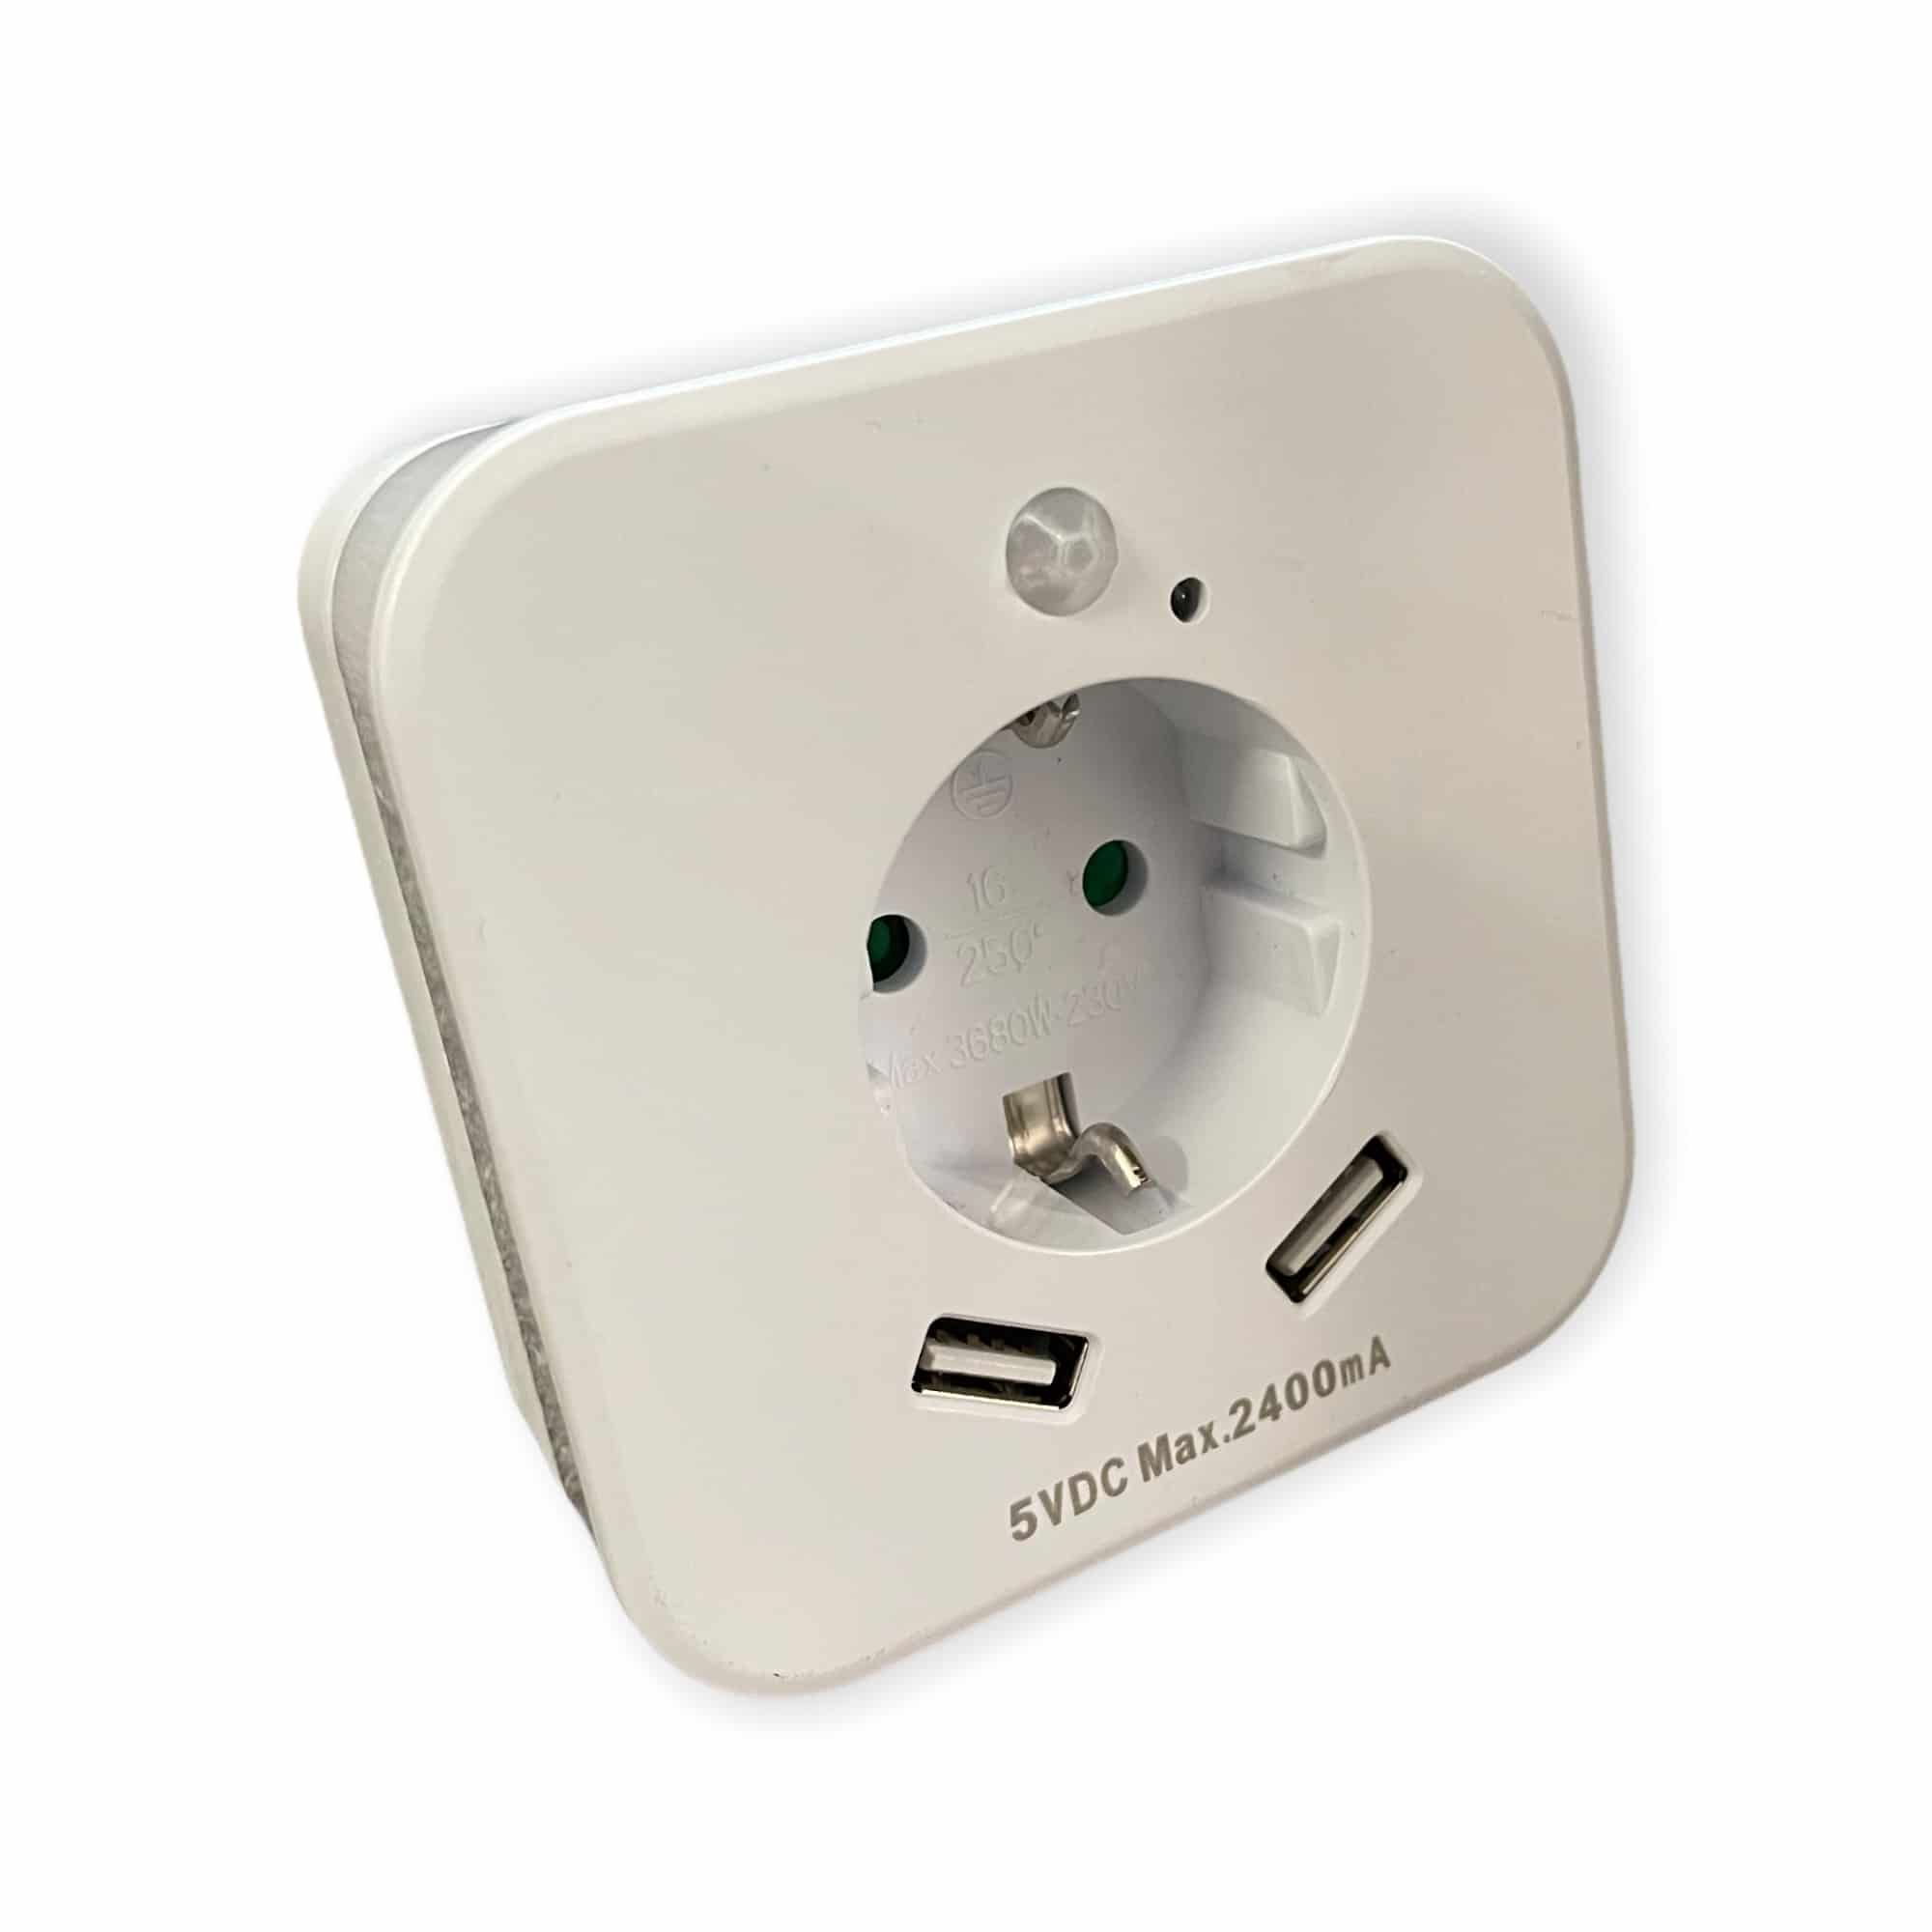 LED-Steckdose mit USB-Anschlüssen